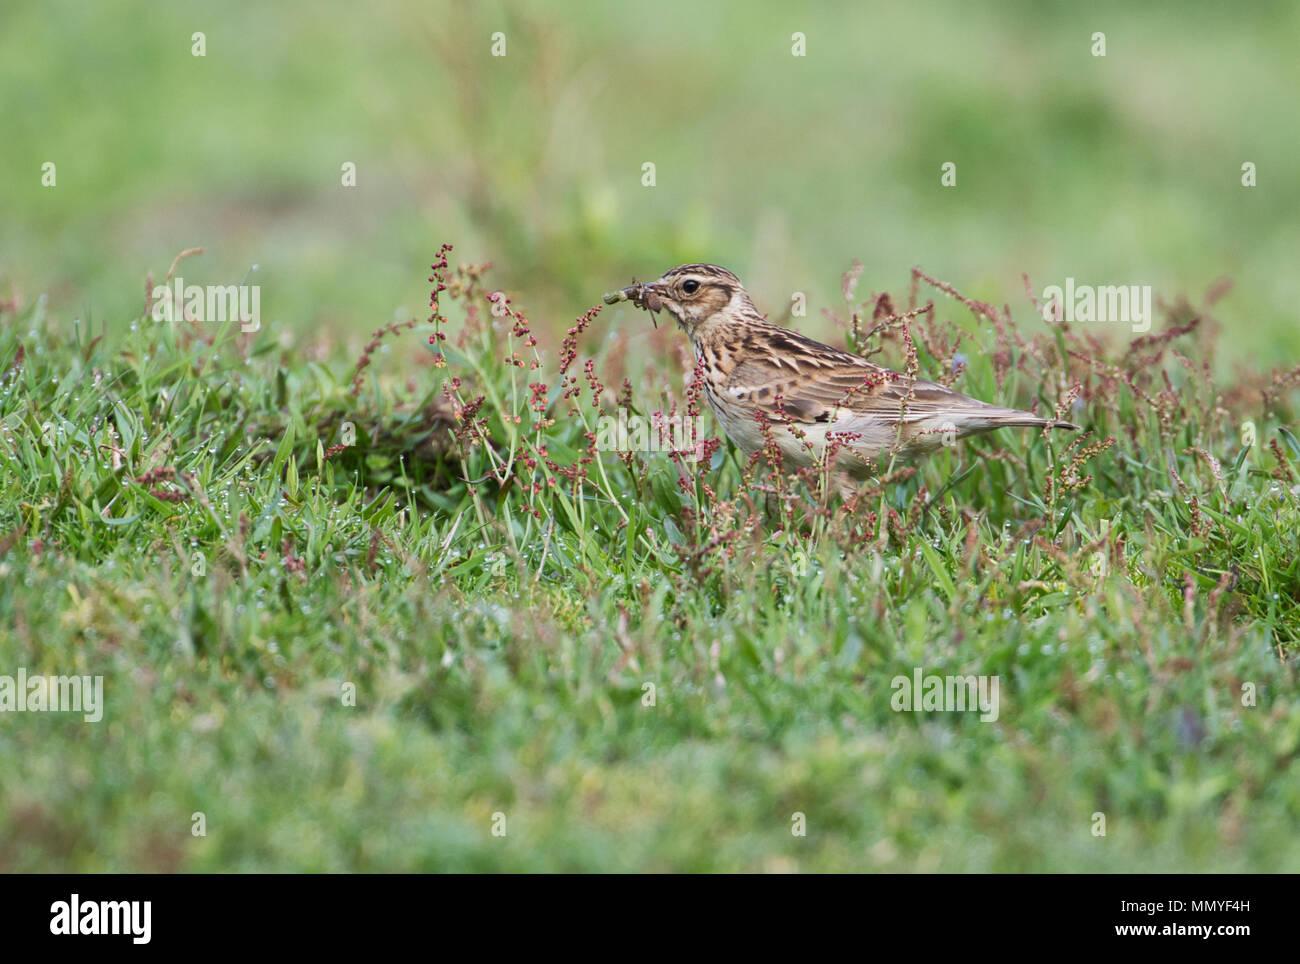 Woodlark (Lullula arborea) gathering invertebrate food - Stock Image